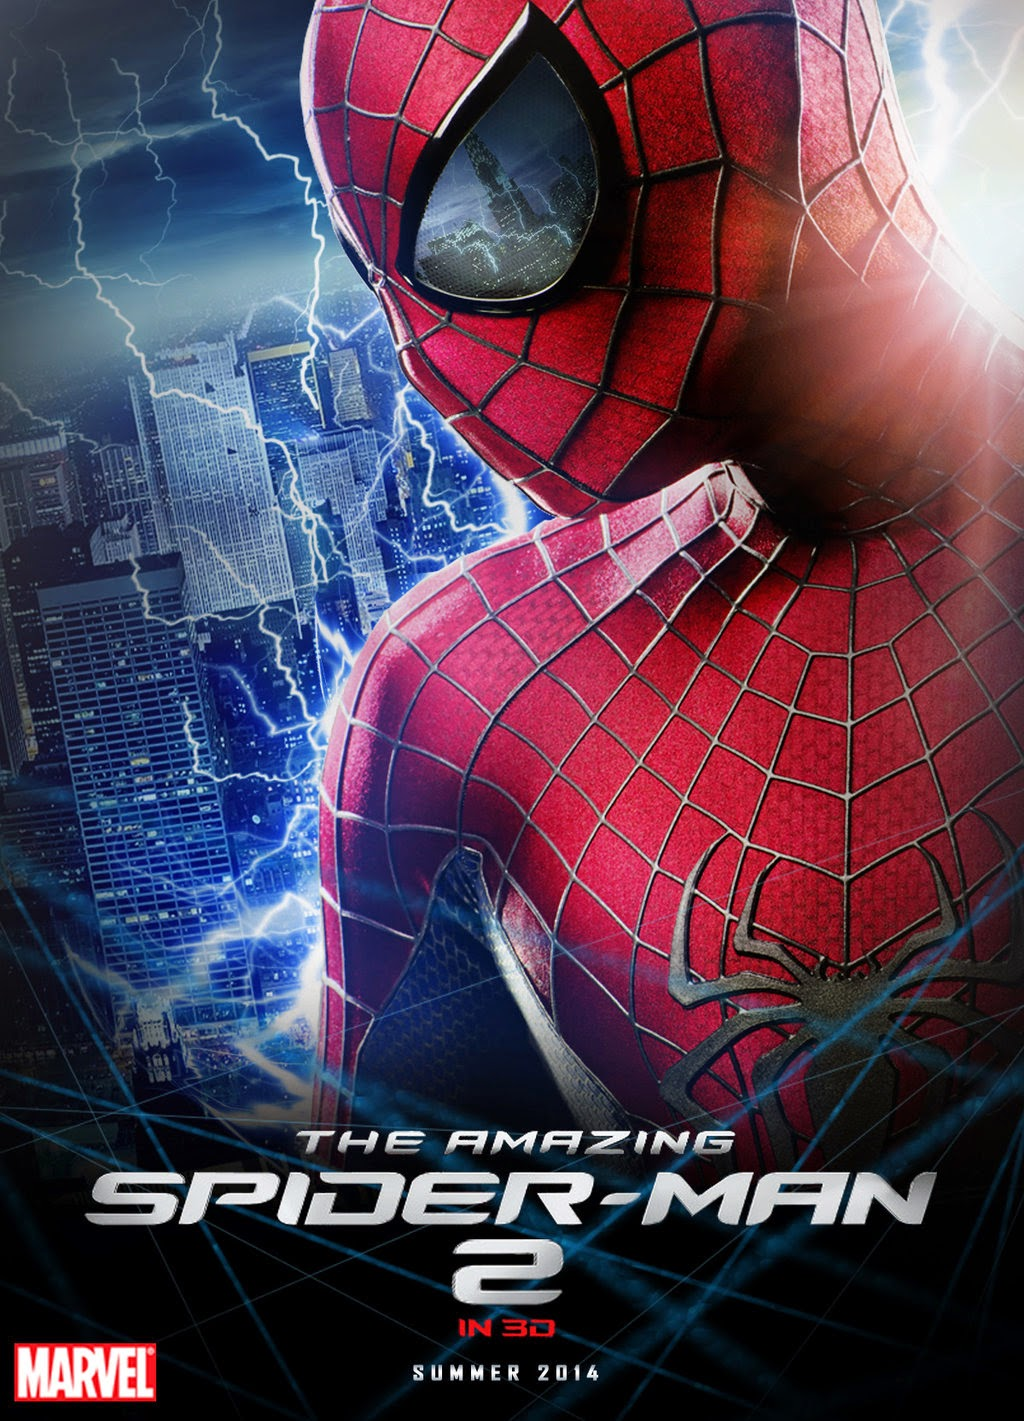 Télécharger The Amazing Spider-Man FRENCH BDRiP gratuitement